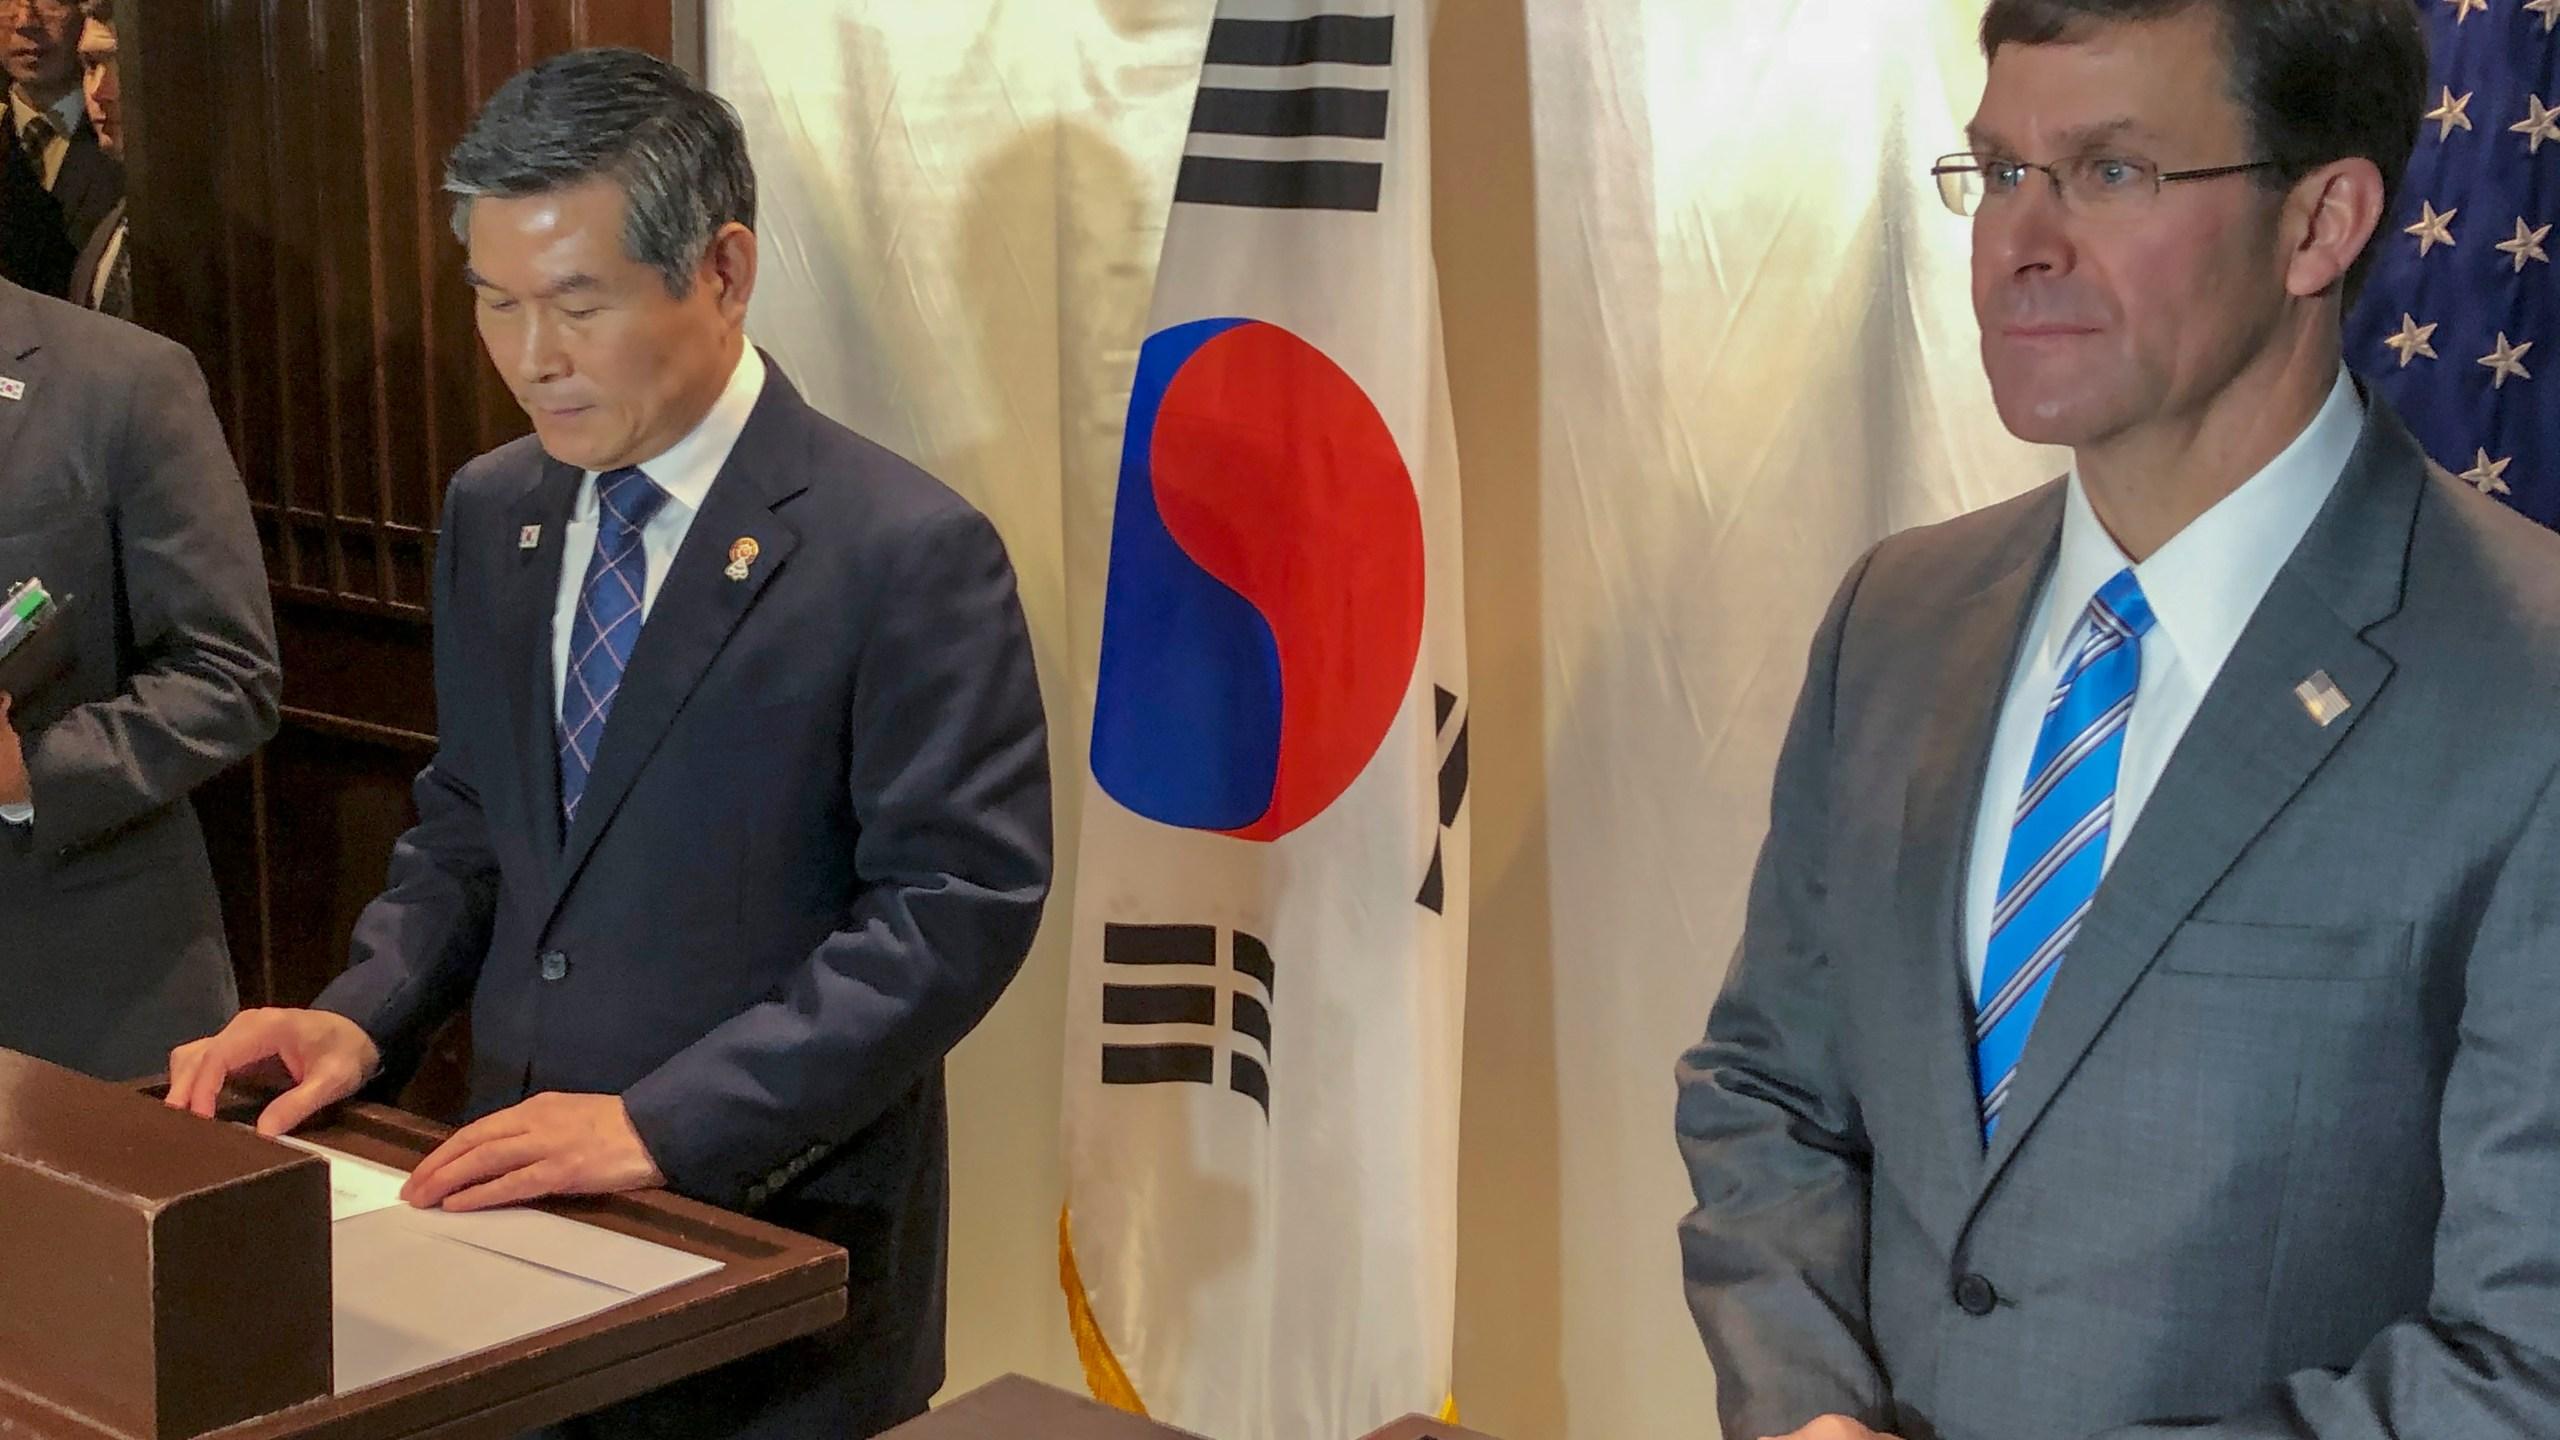 Mark Esper, Jeong Kyeong-doo